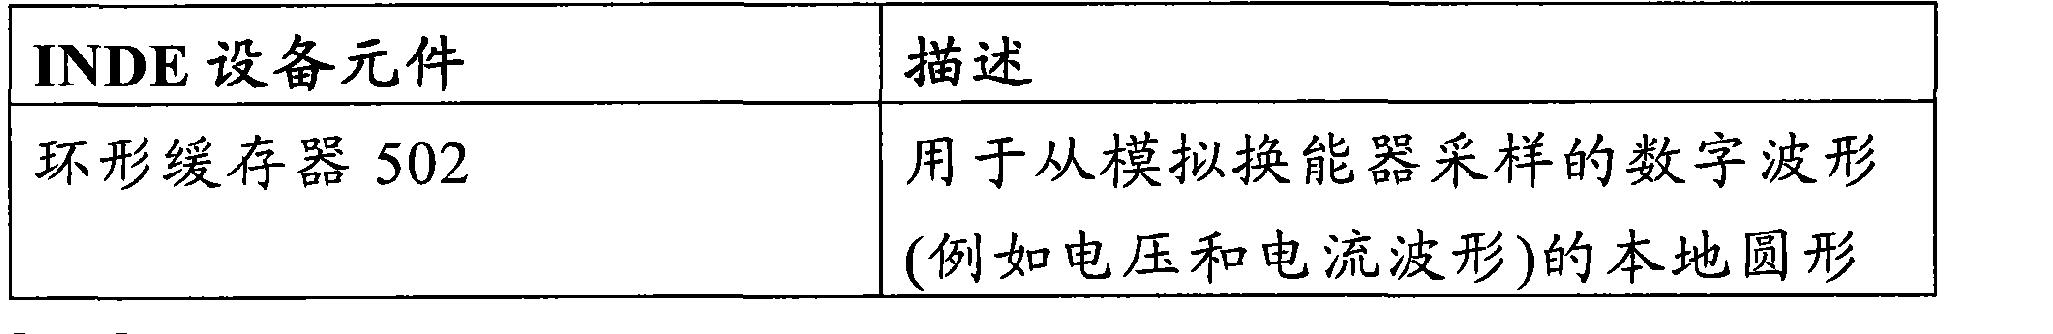 Figure CN102812334AD00221